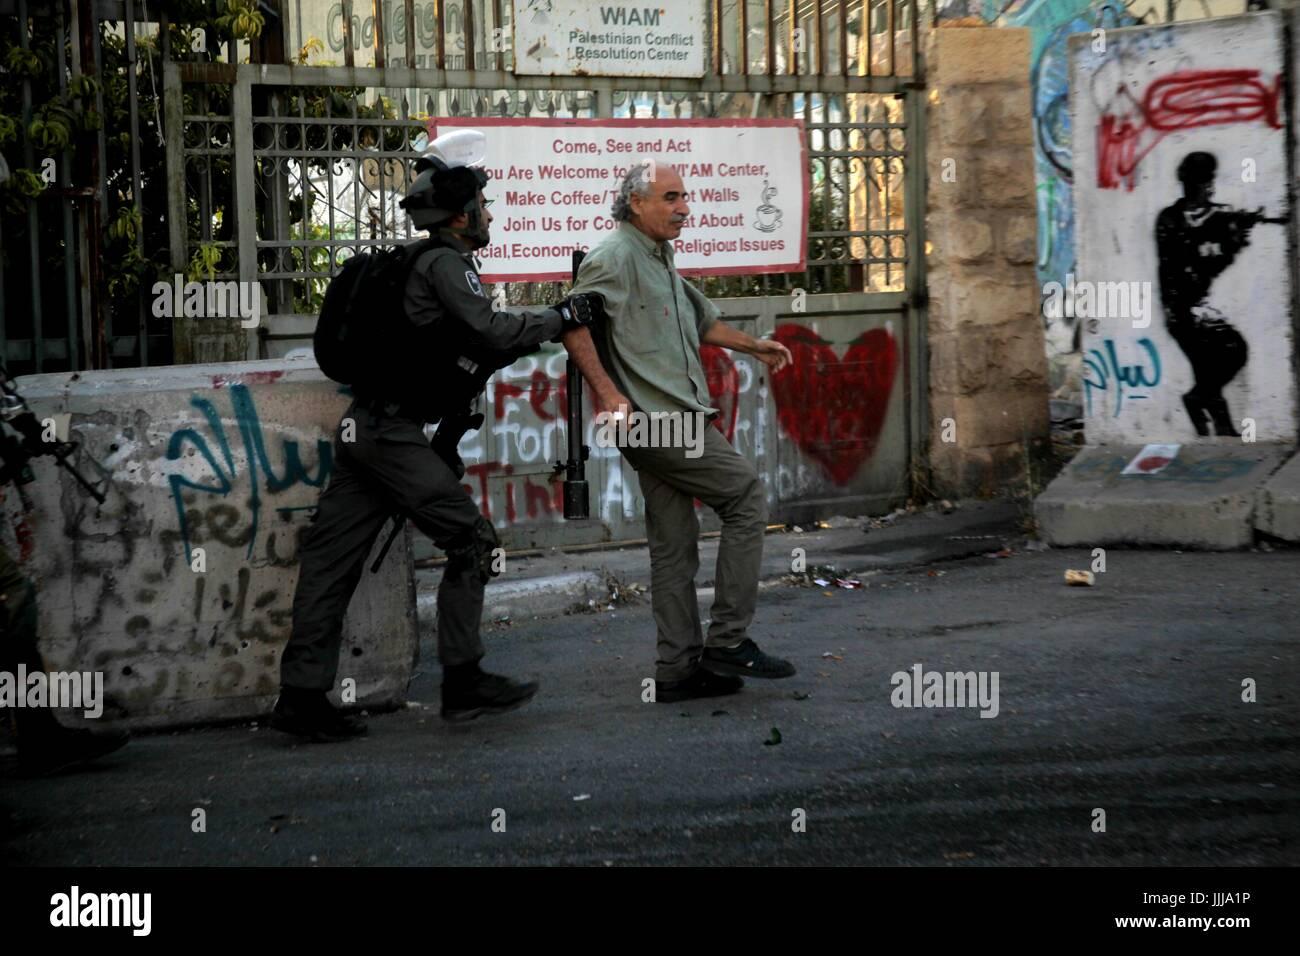 Bethlehem, West Bank city of Bethlehem. 19th July, 2017. An Israeli border policeman detains a Palestinian protester Stock Photo